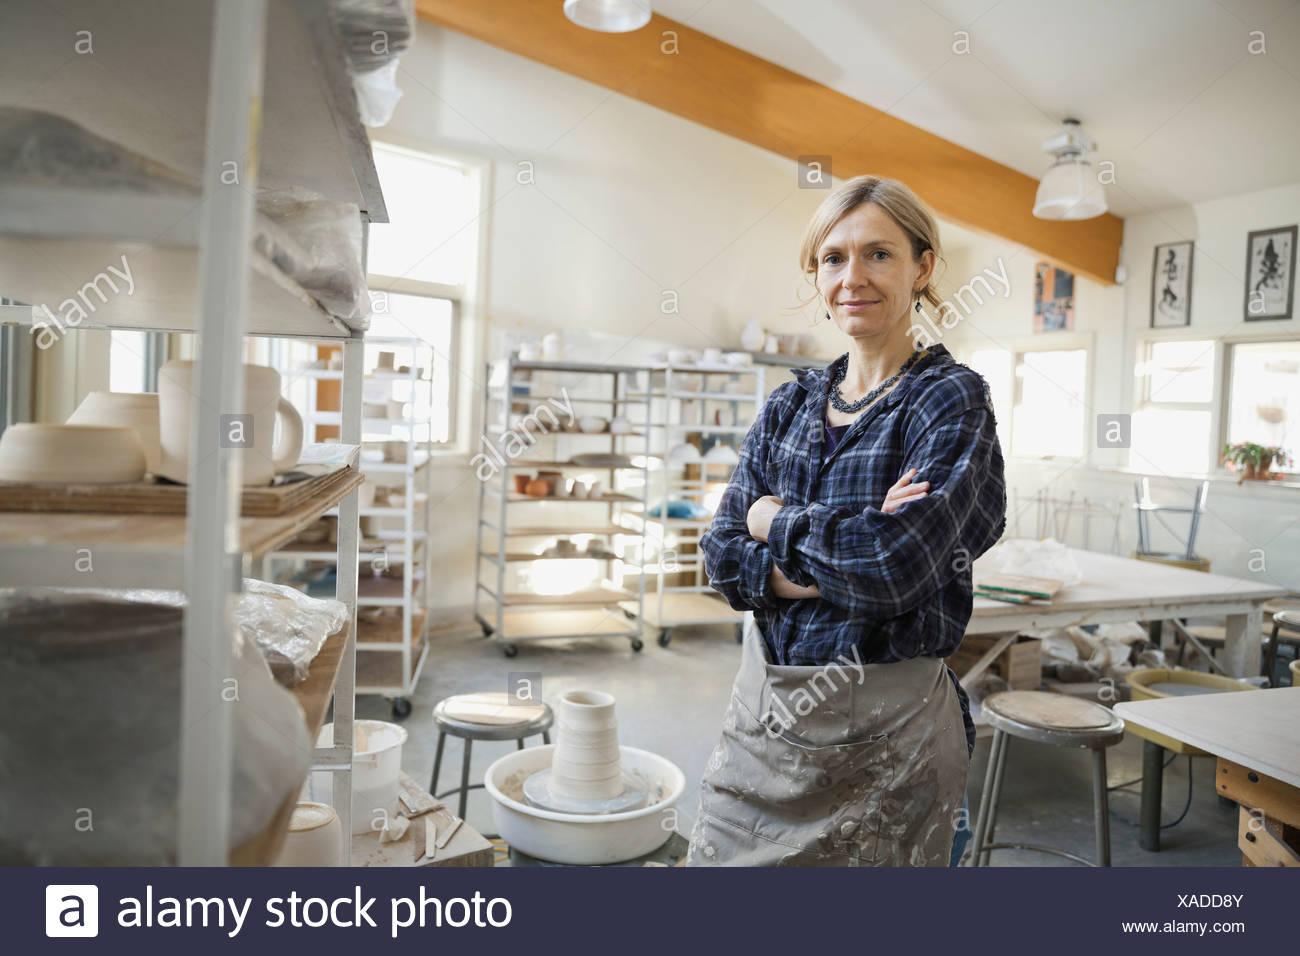 Portrait of confident woman in pottery studio - Stock Image